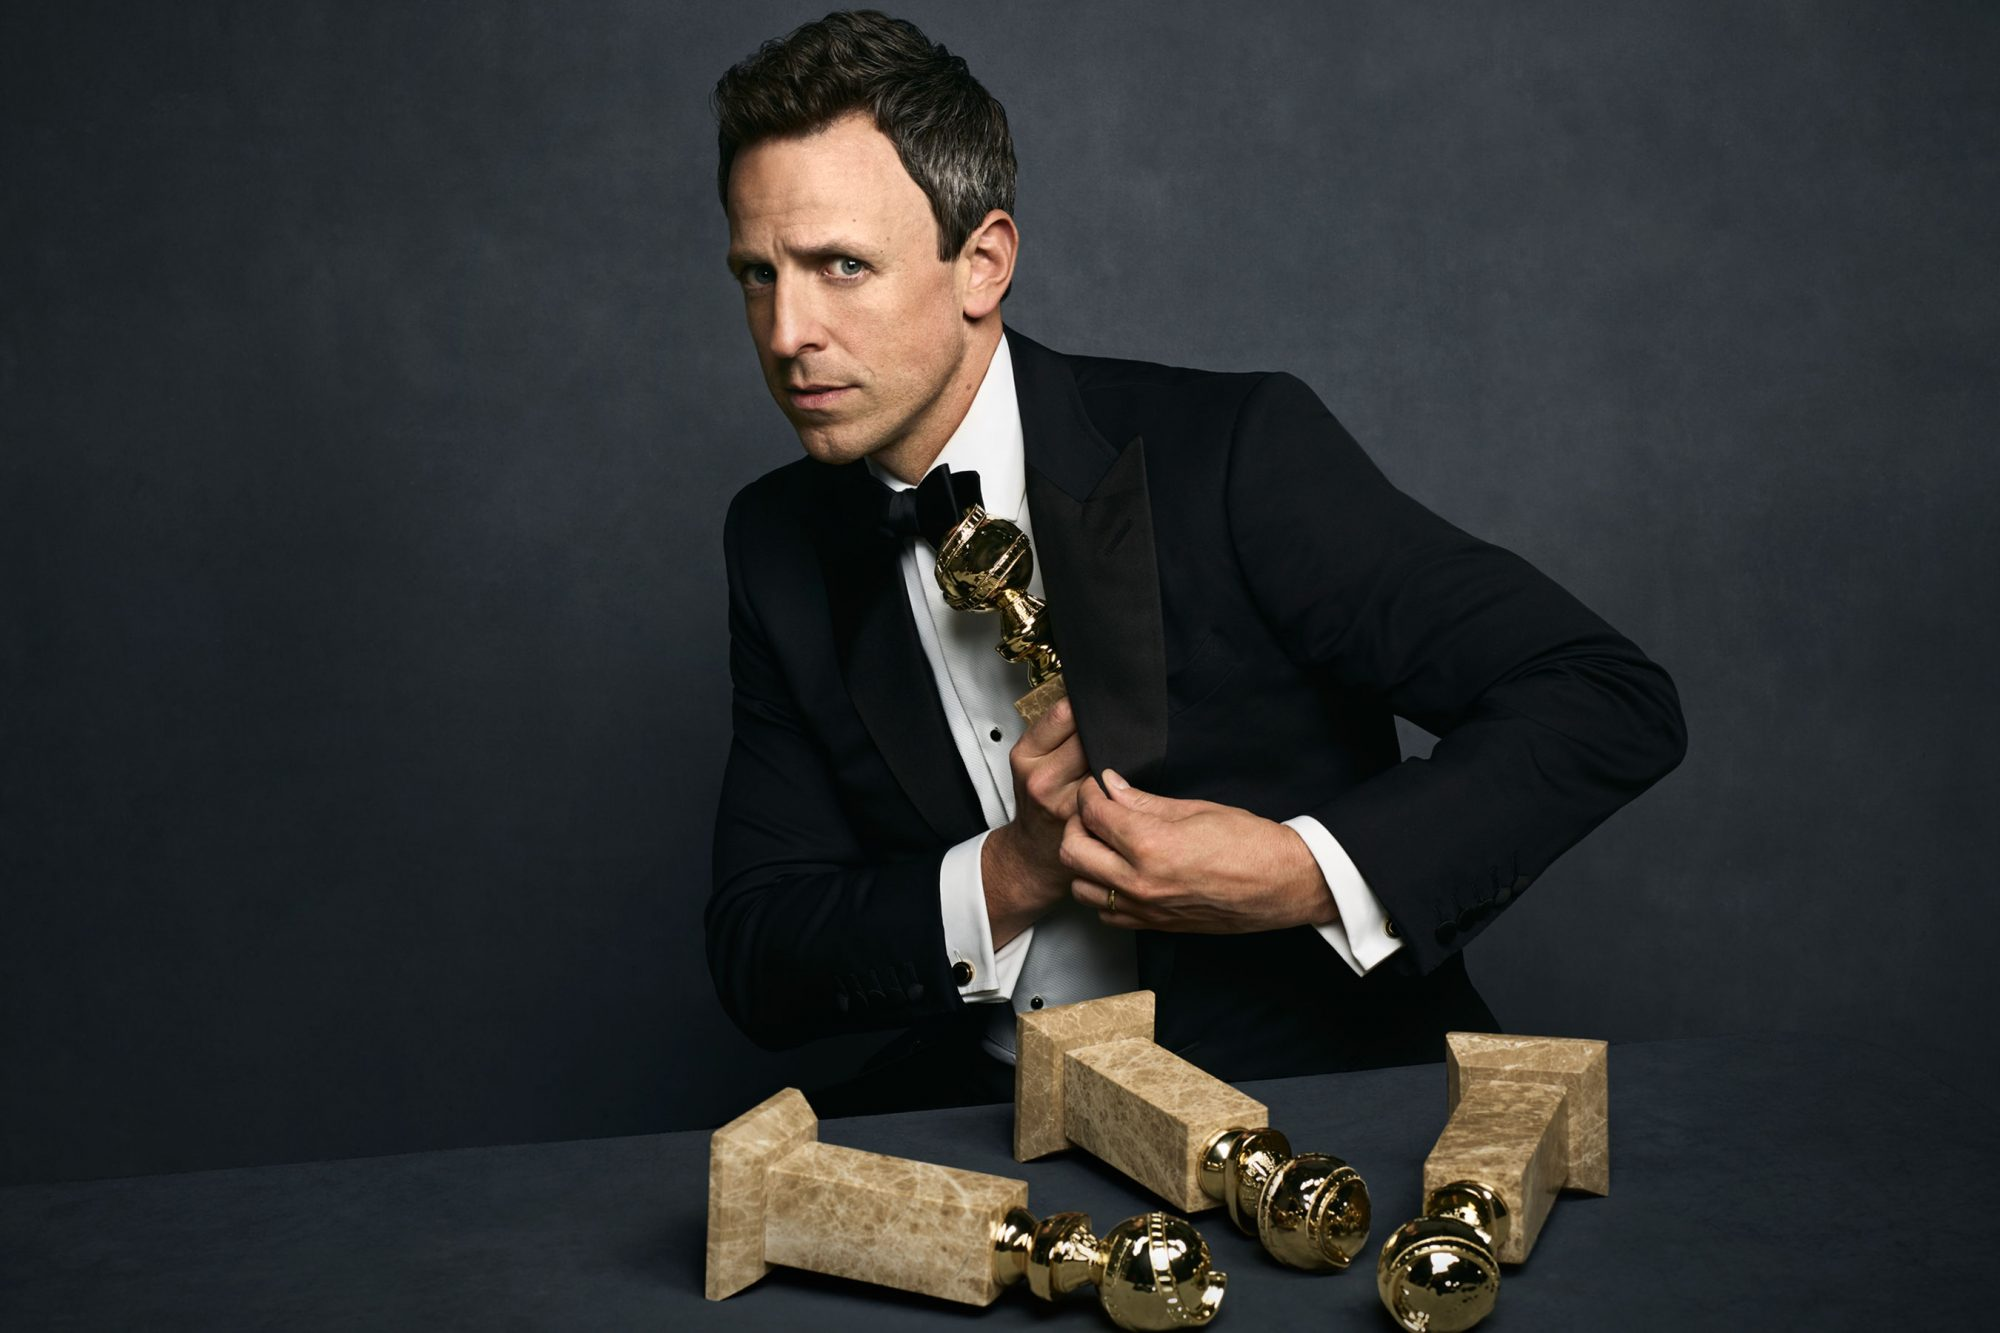 Golden Globe Awards - Season 75